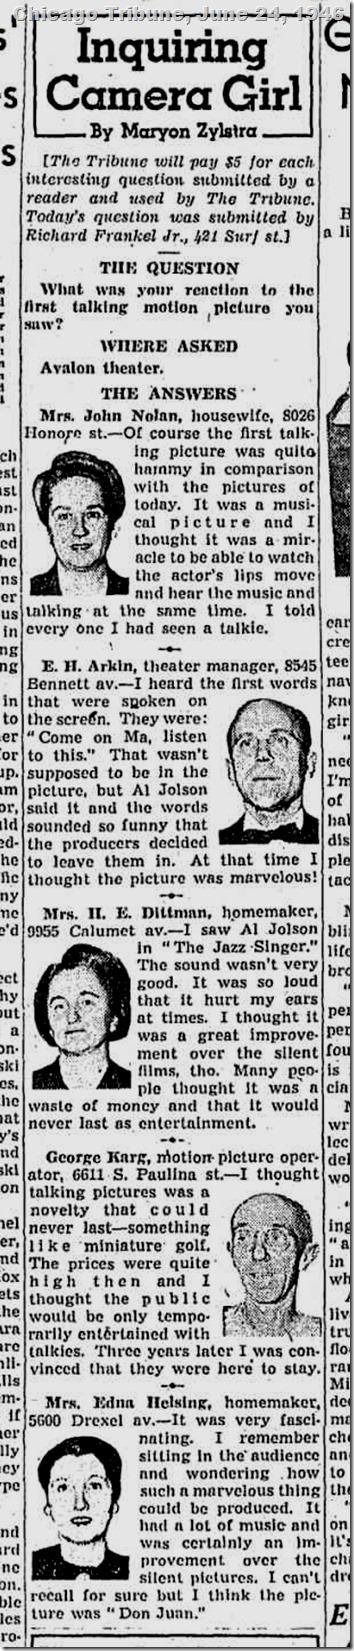 June 24, 1946, First Talkie